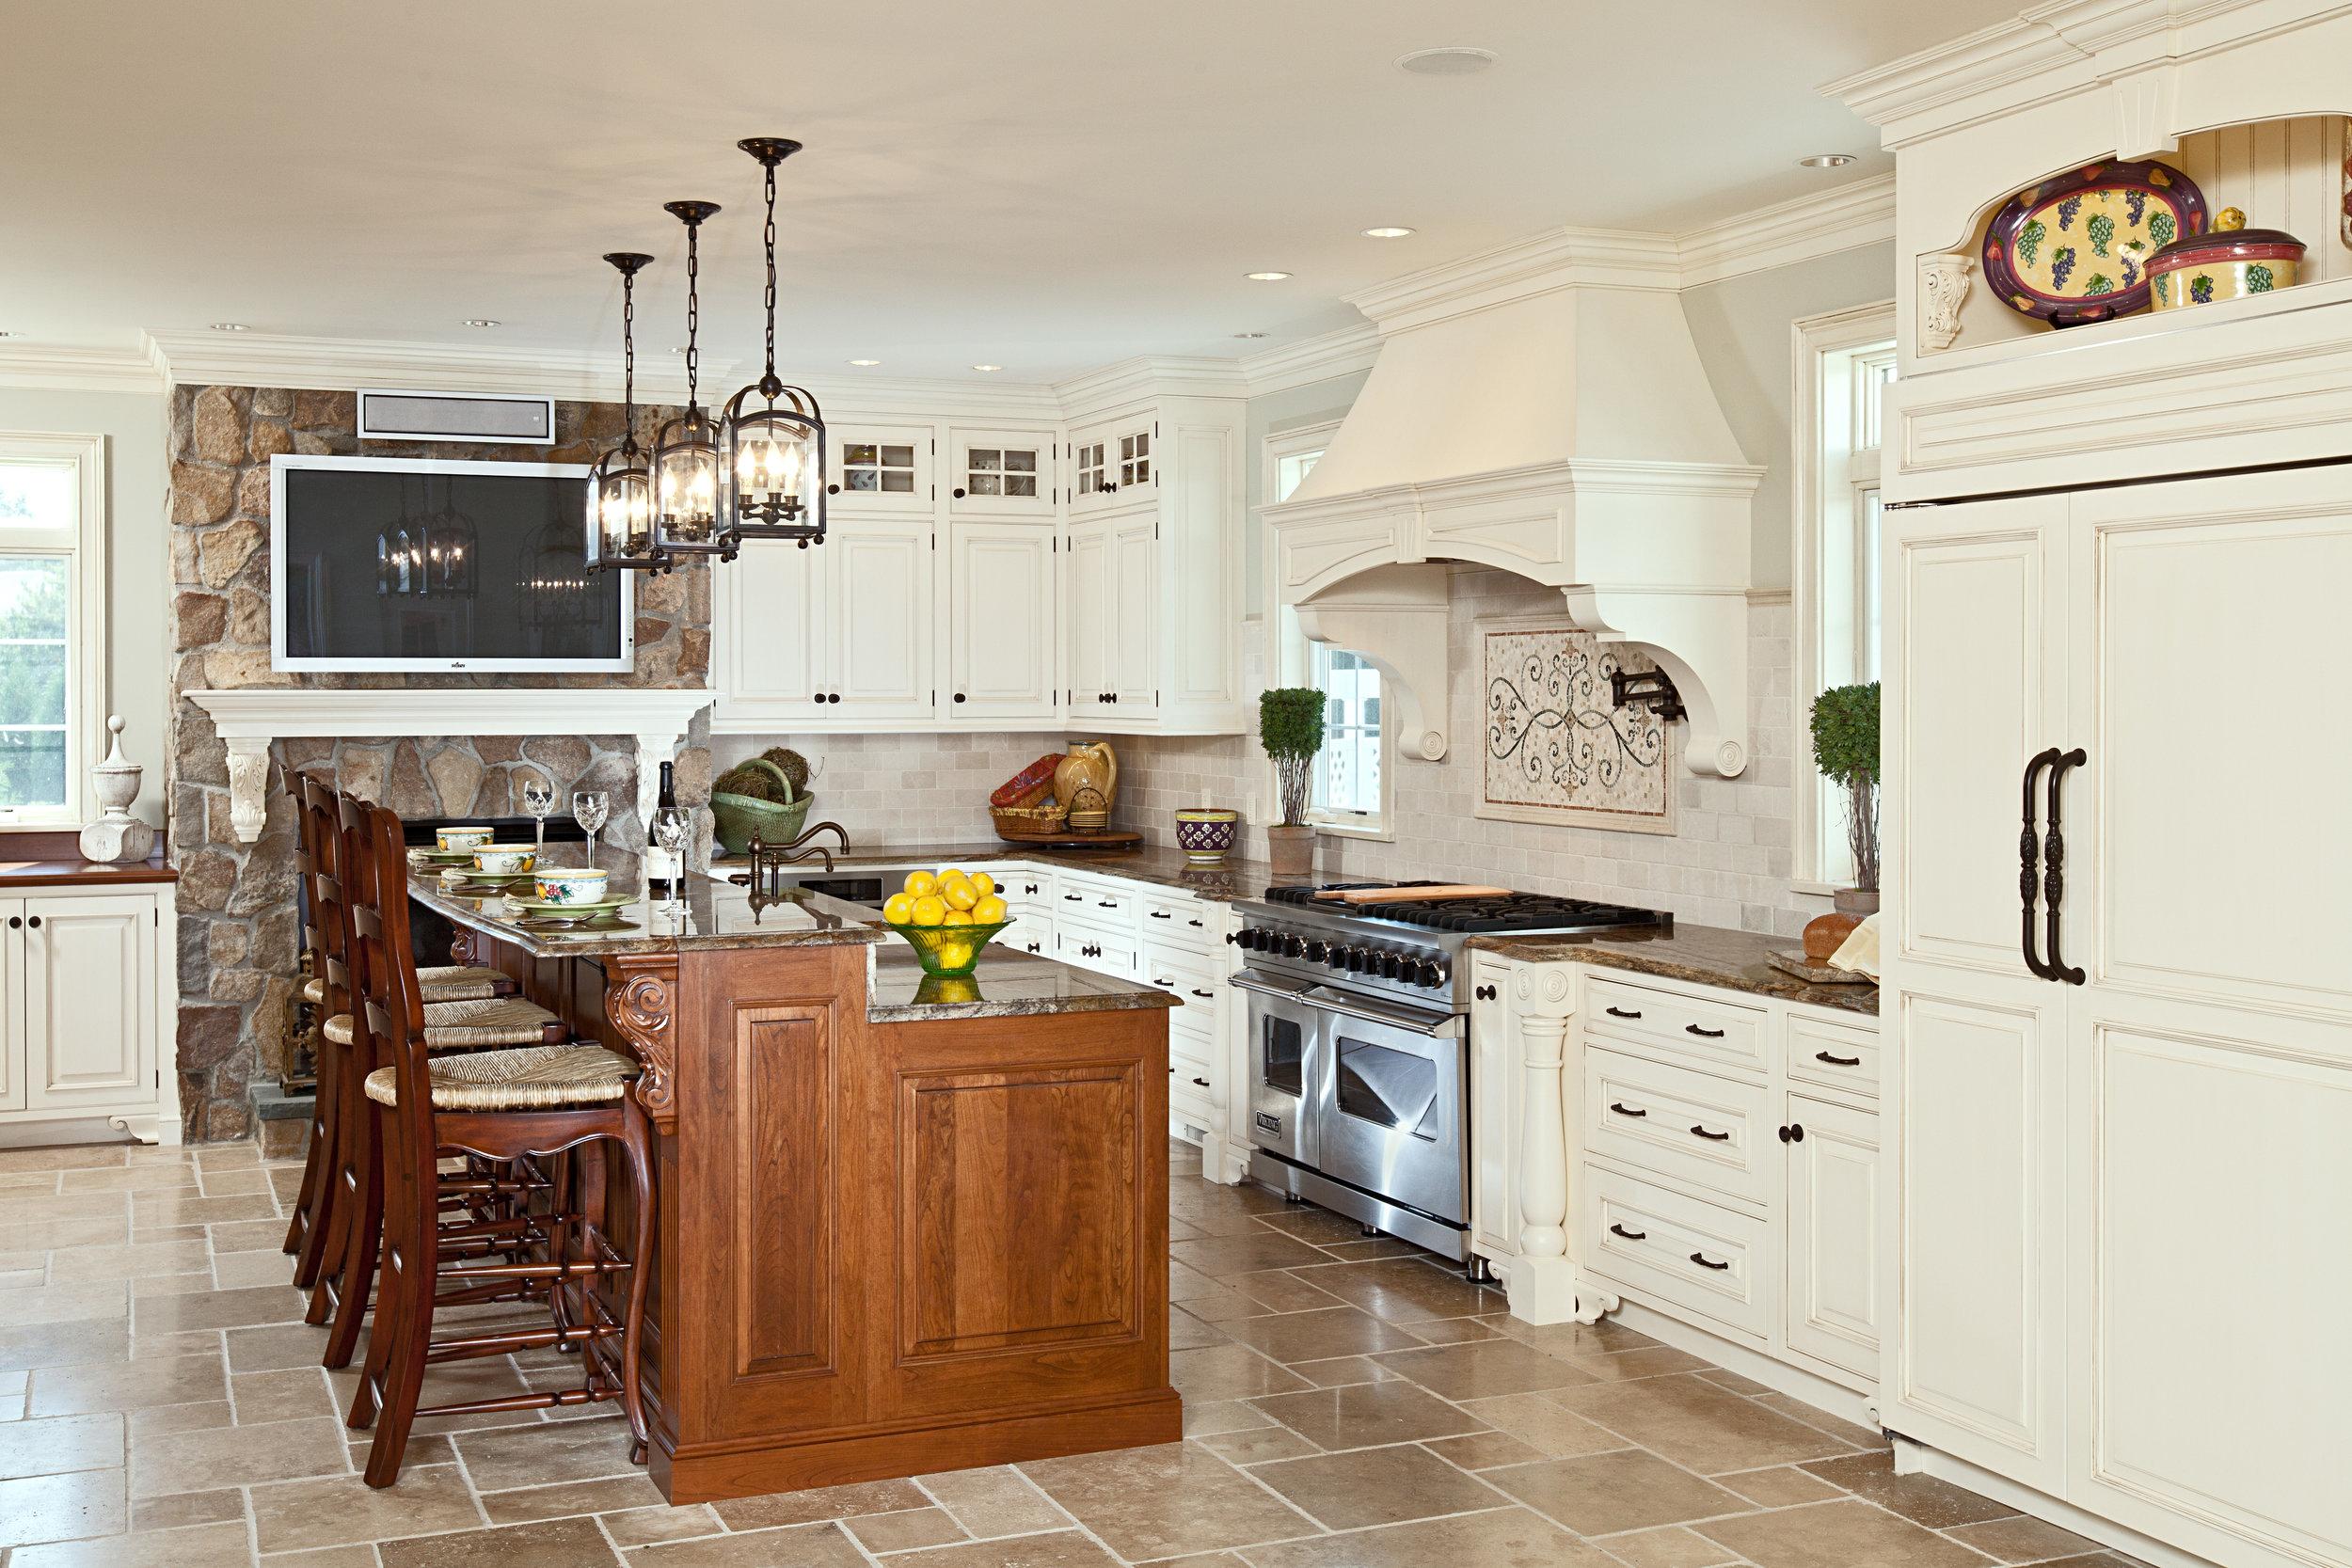 Copy of interior-photography-Berkshires-20100831_0070.jpg